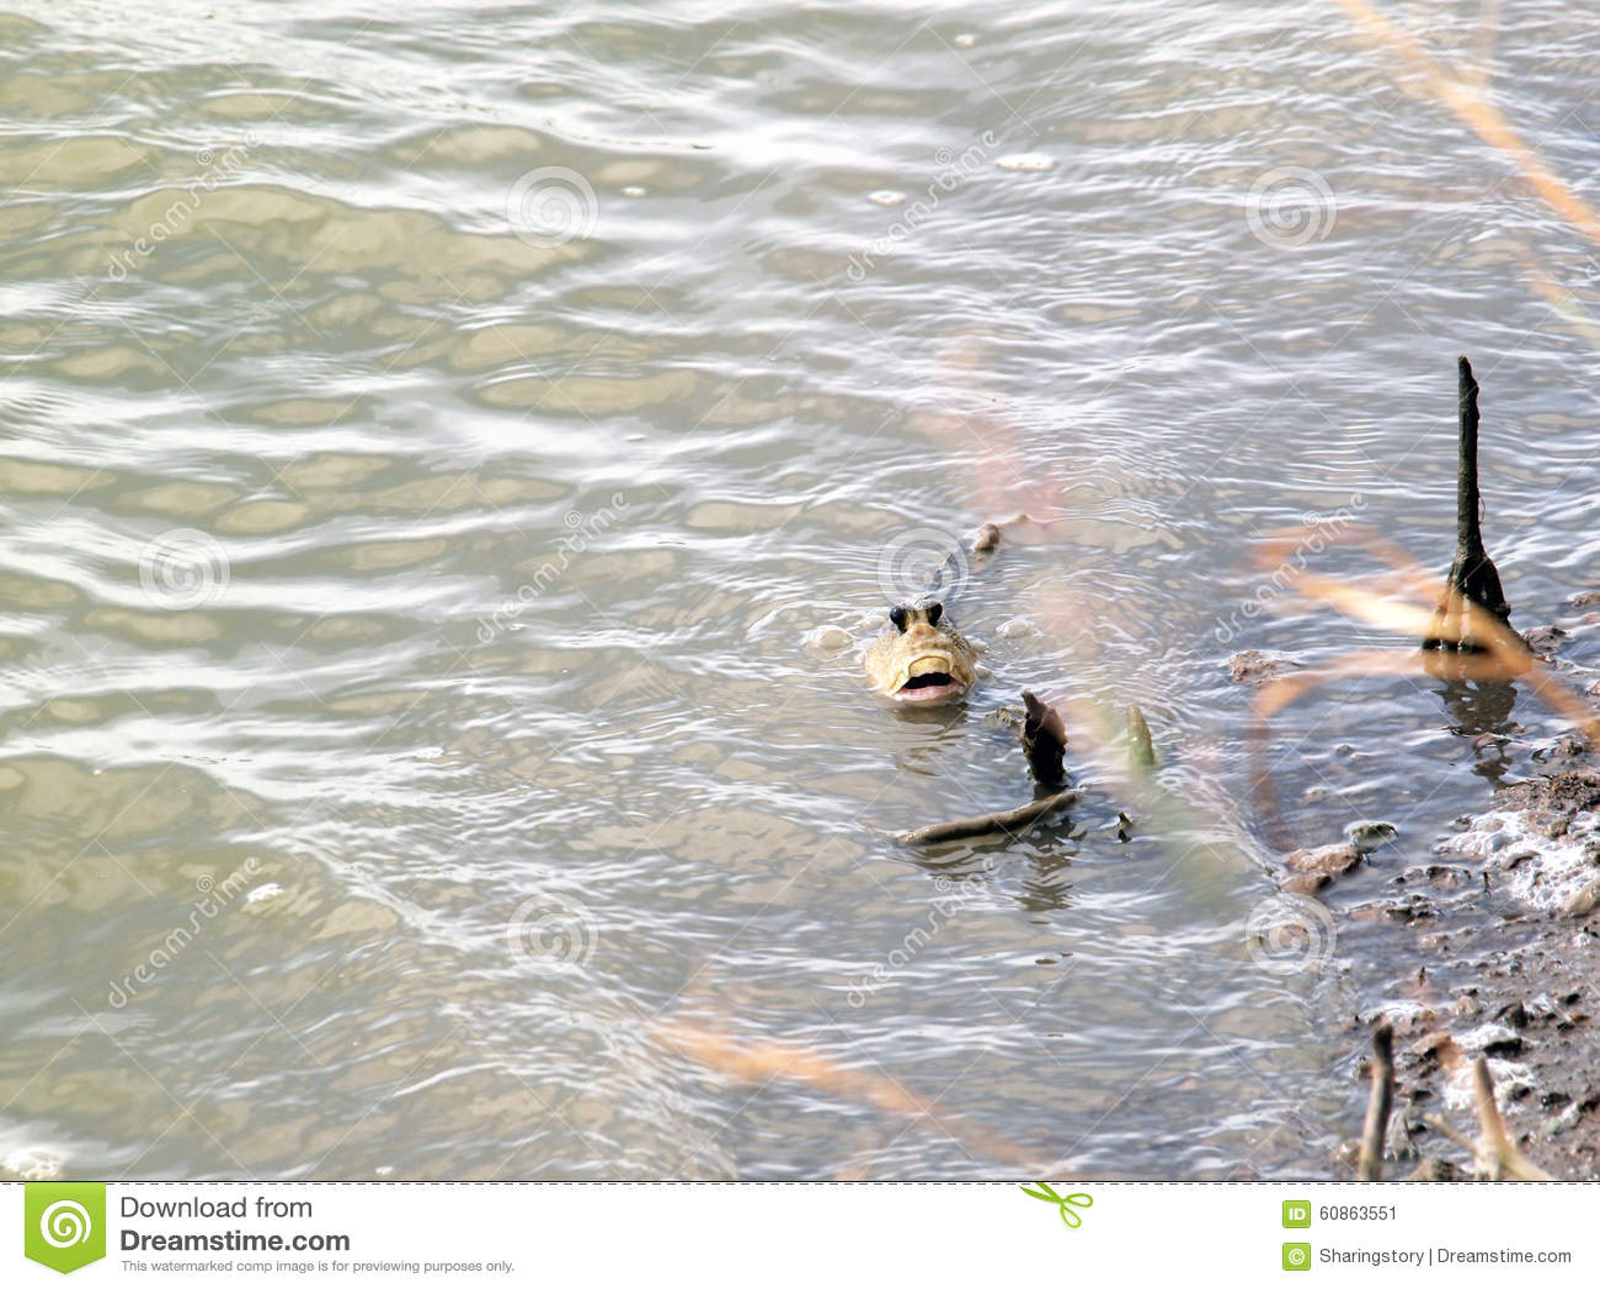 Mudskipper Stock Photo - Image: 60863551